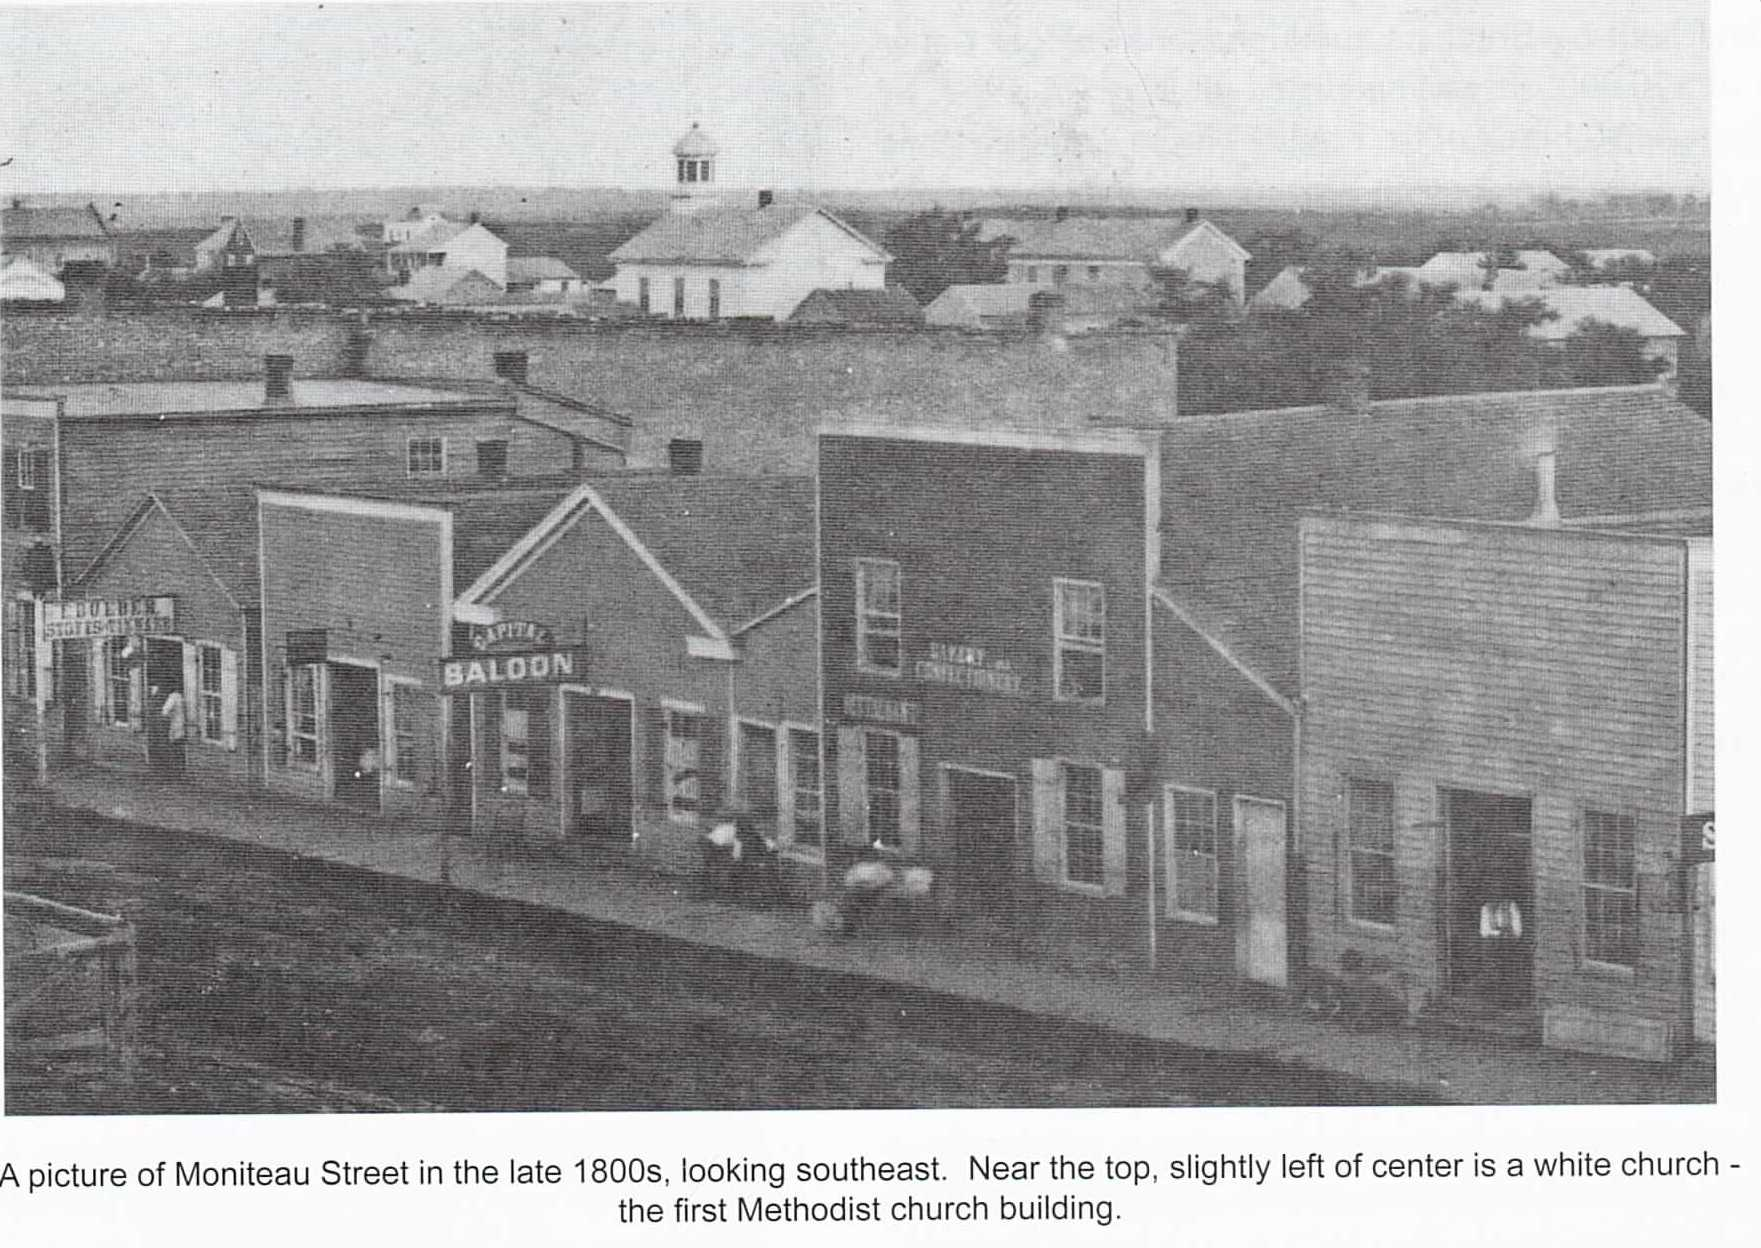 United Methodist Church Tipton Bet 1840 Amp 1855 Present